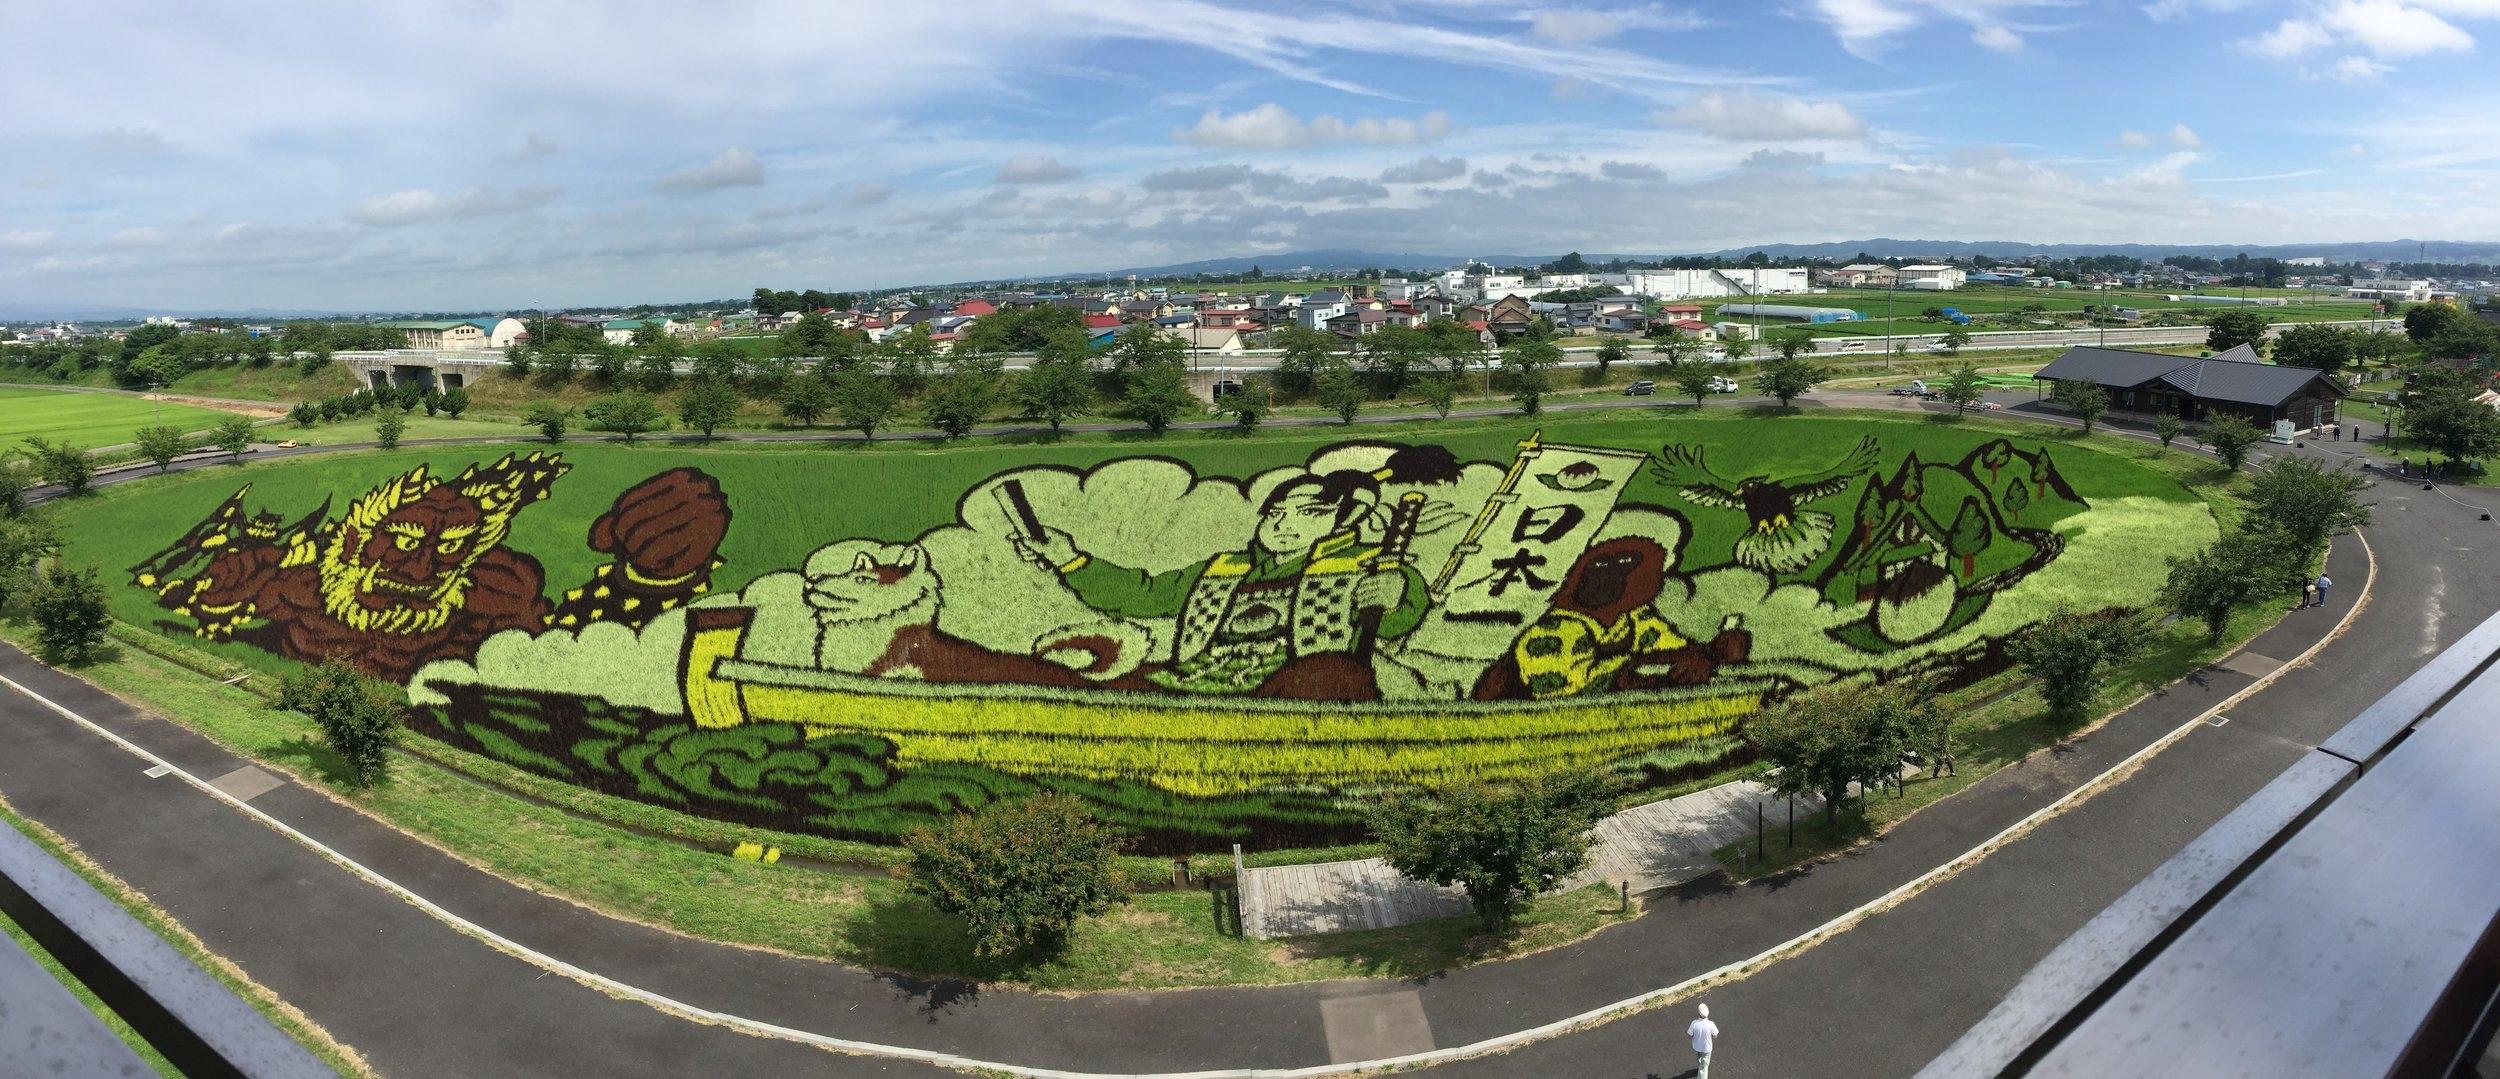 Rice Paddy Fields in Japan via Jitneys